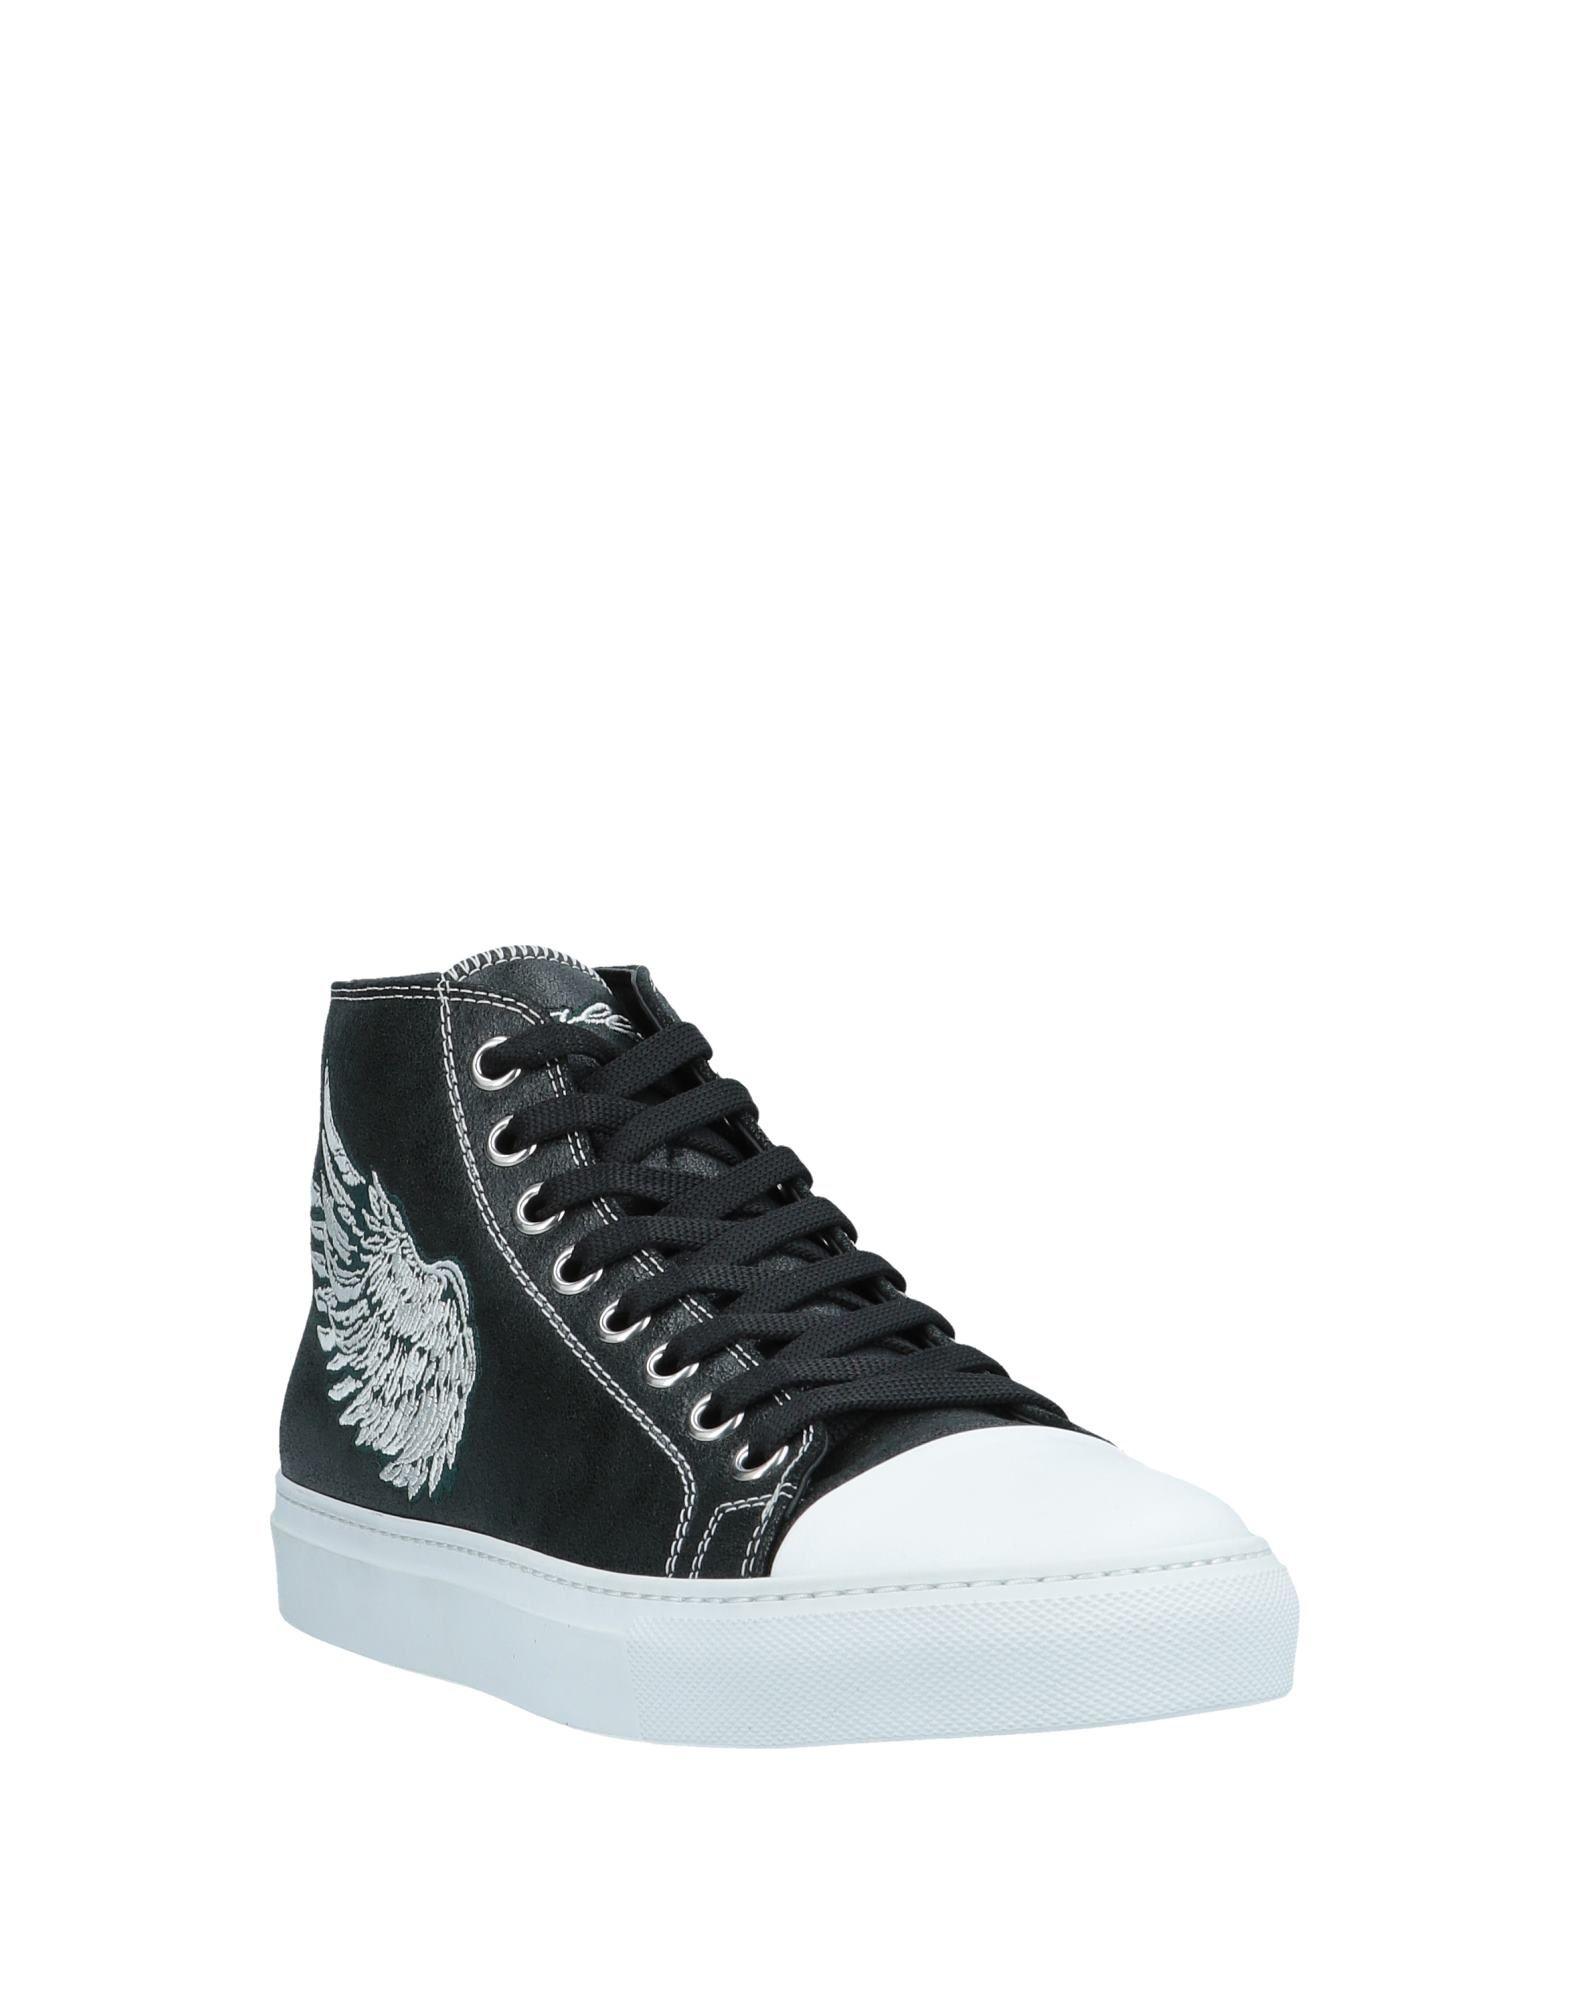 Roberto Cavalli Sneakers Sneakers Sneakers - Men Roberto Cavalli Sneakers online on  Australia - 11577135RW 4a3ede